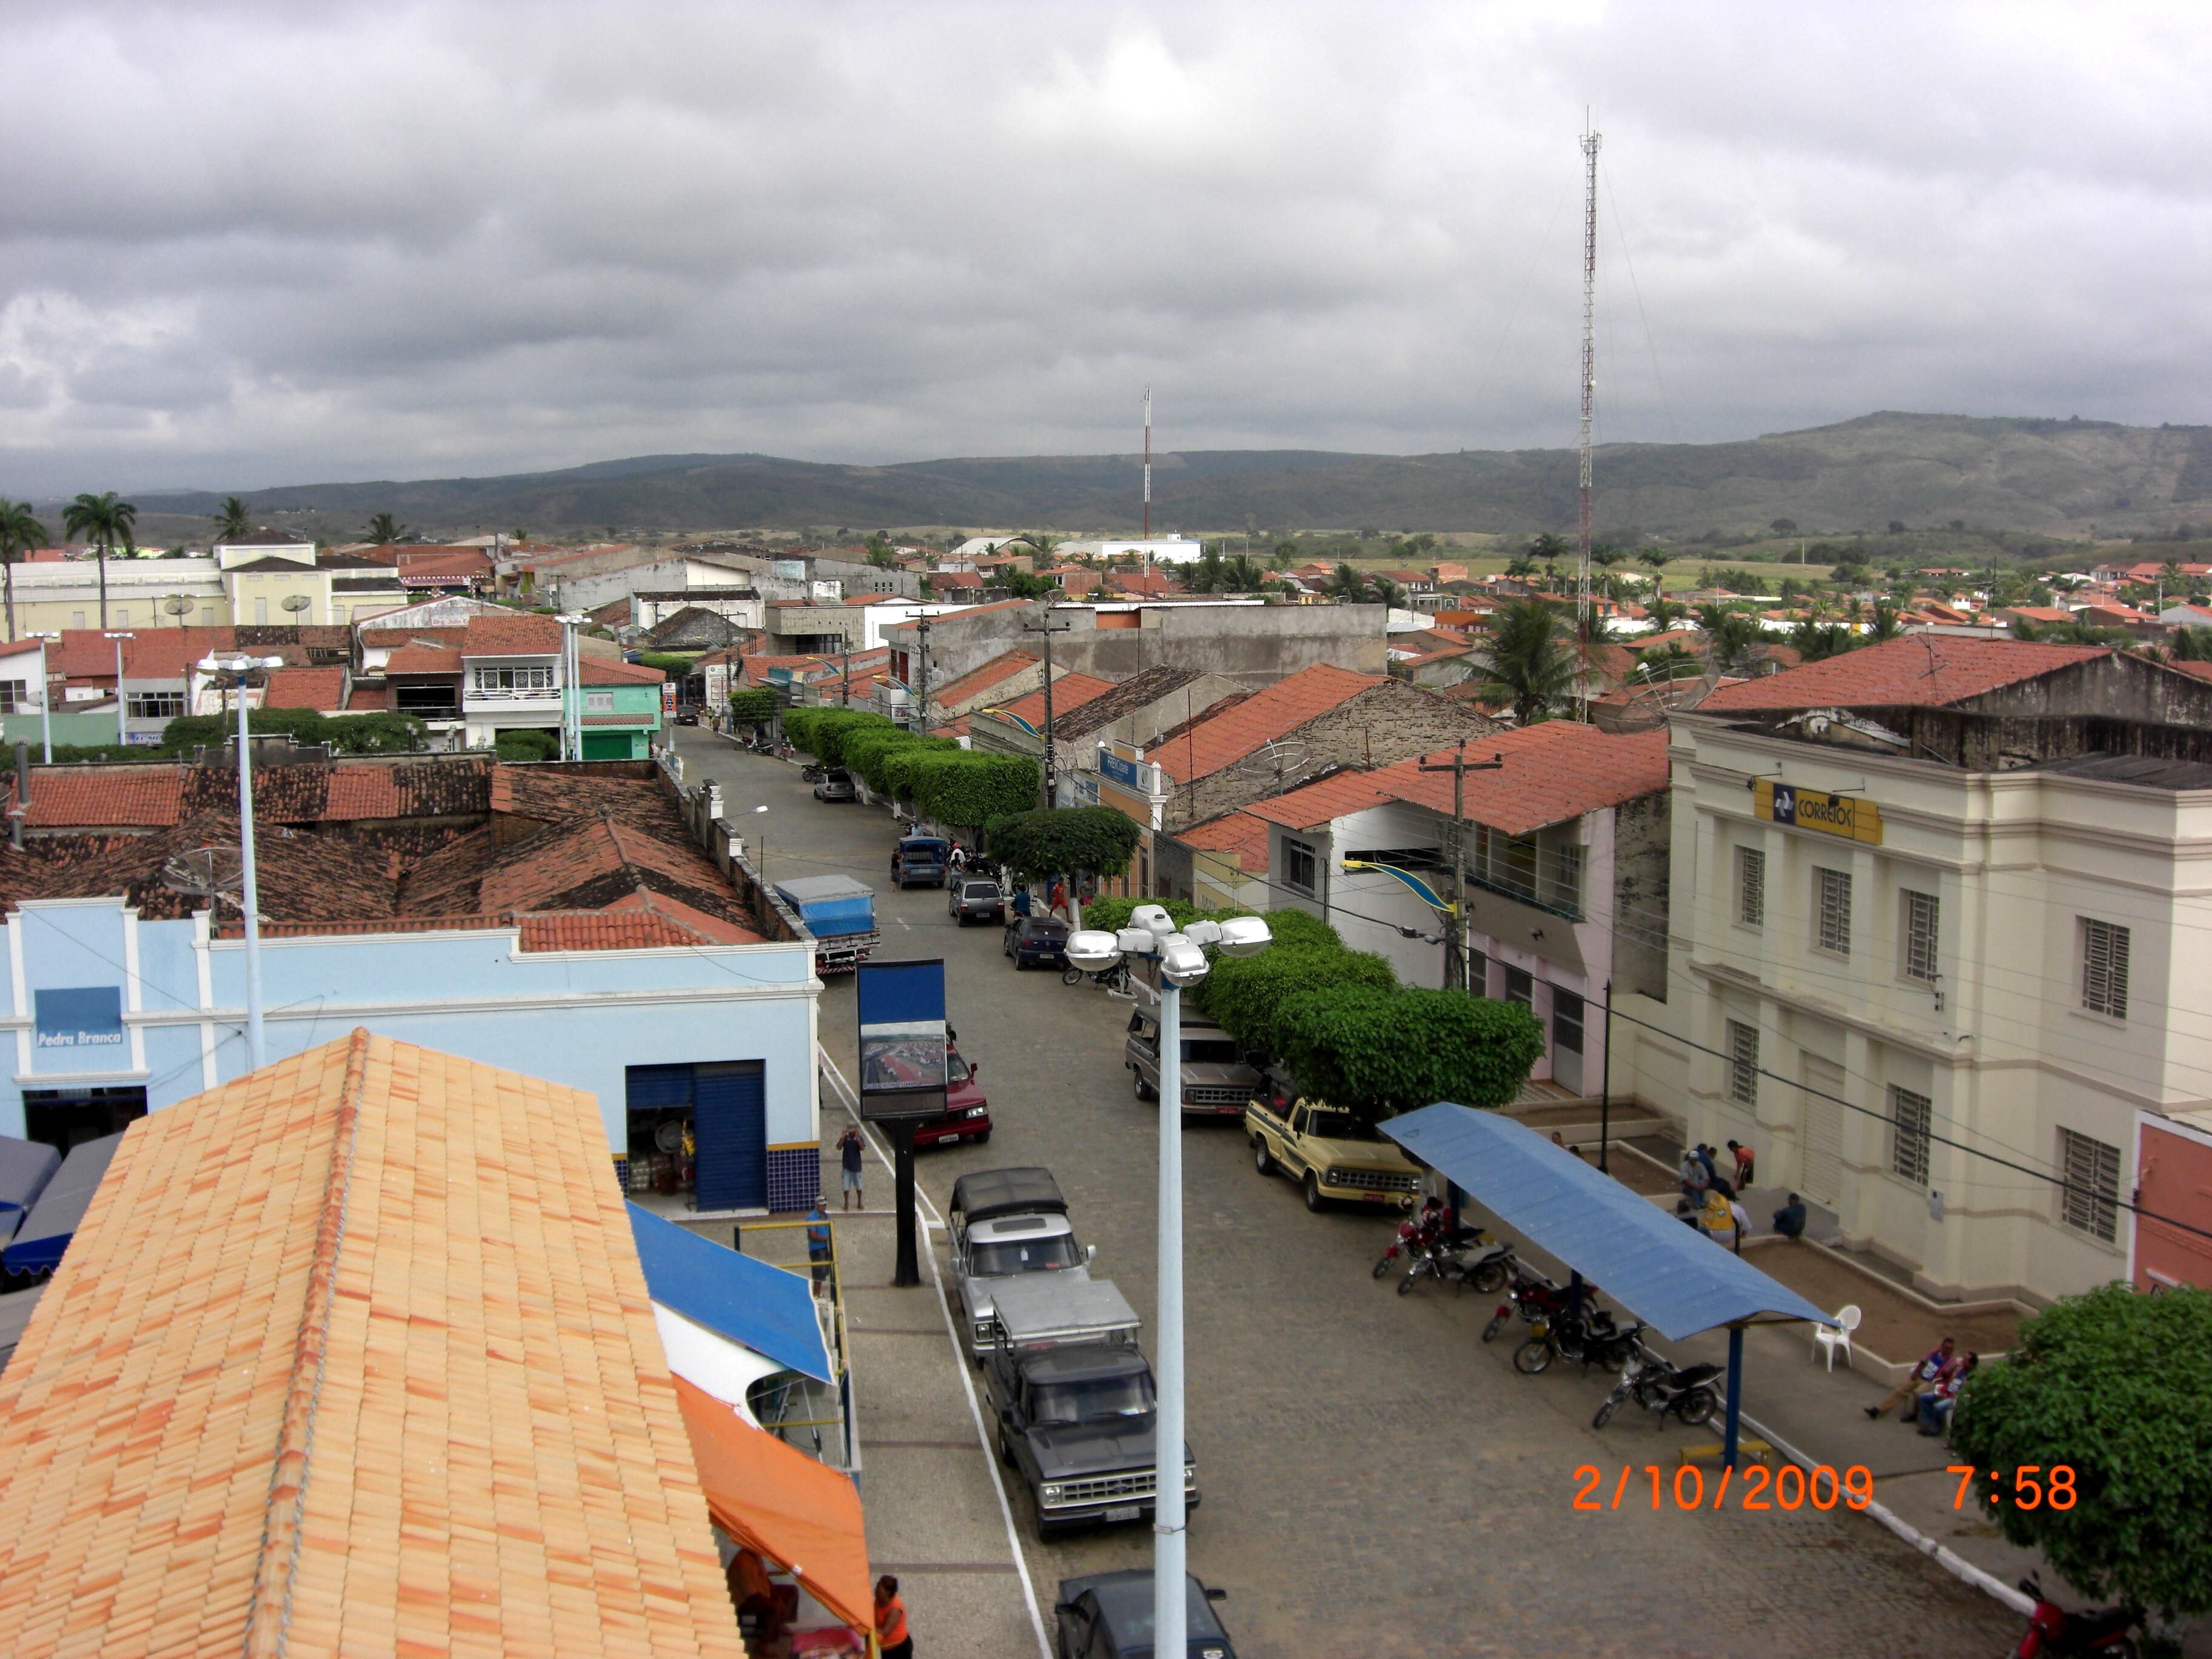 Pedra Branca Ceará fonte: upload.wikimedia.org